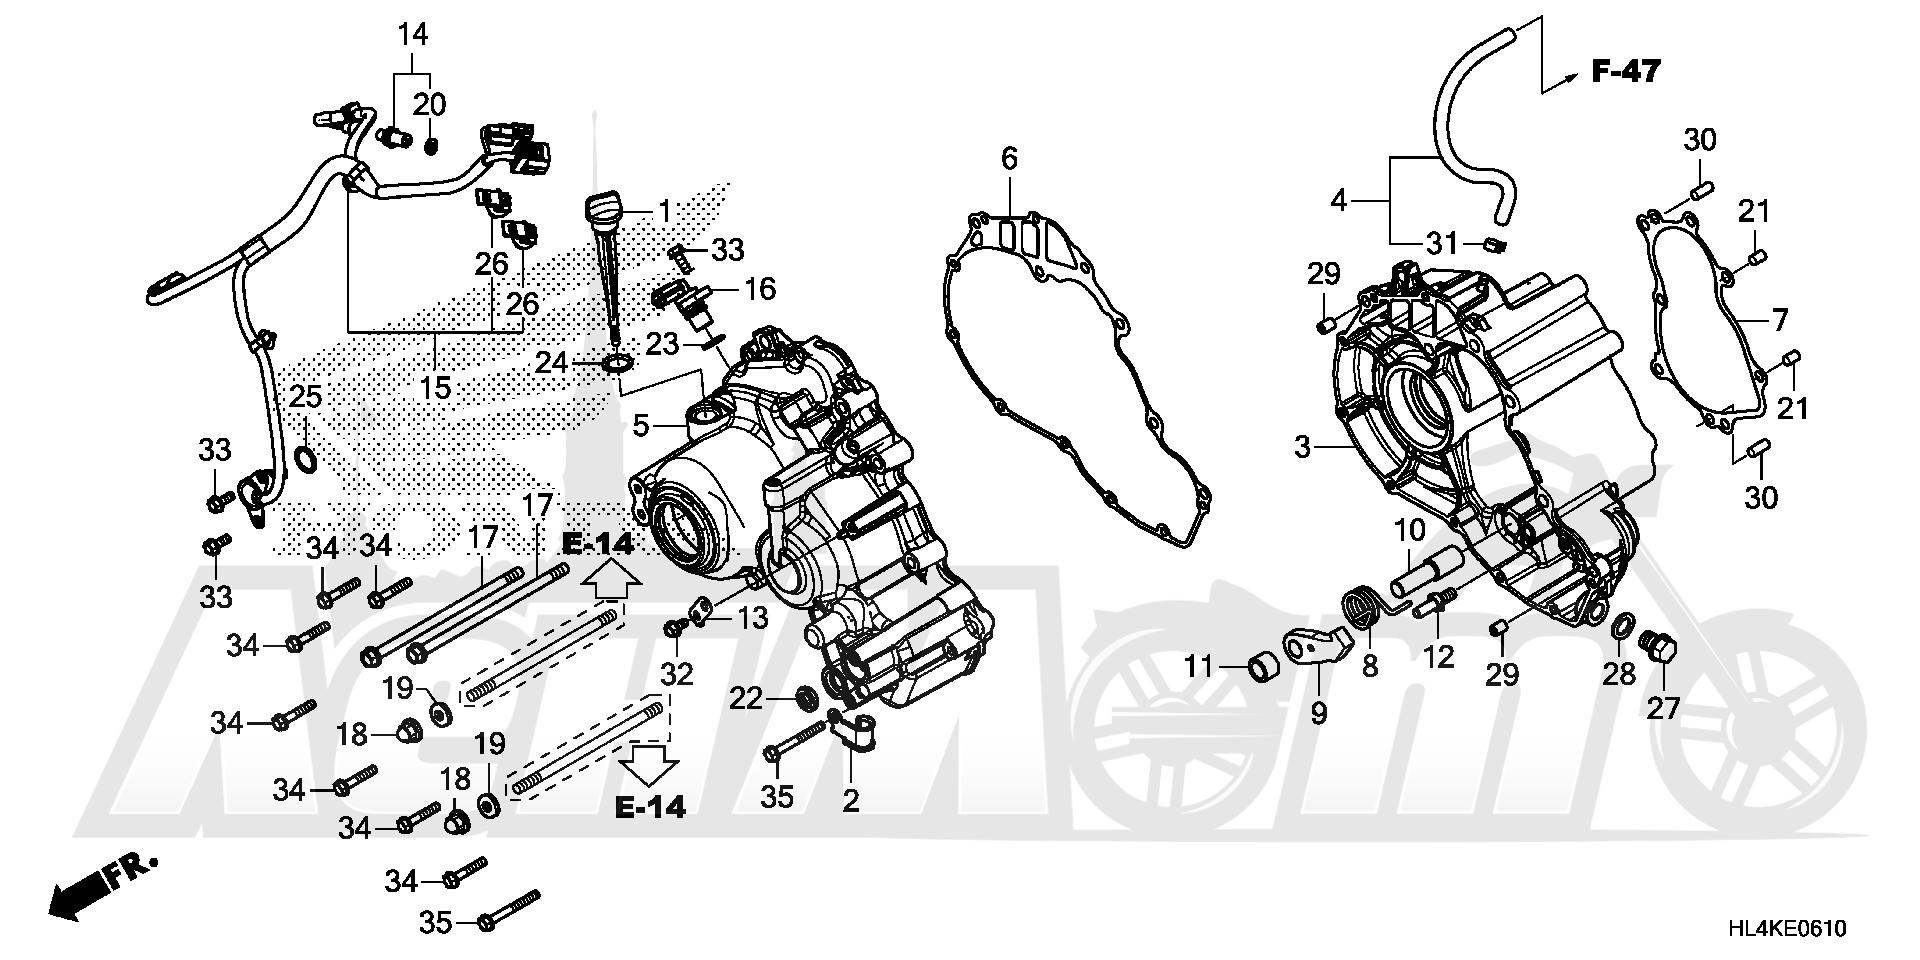 Запчасти для Квадроцикла Honda 2019 SXS1000M5D Раздел: SUB-TRANSMISSION CASE | SUB трансмиссия корпус